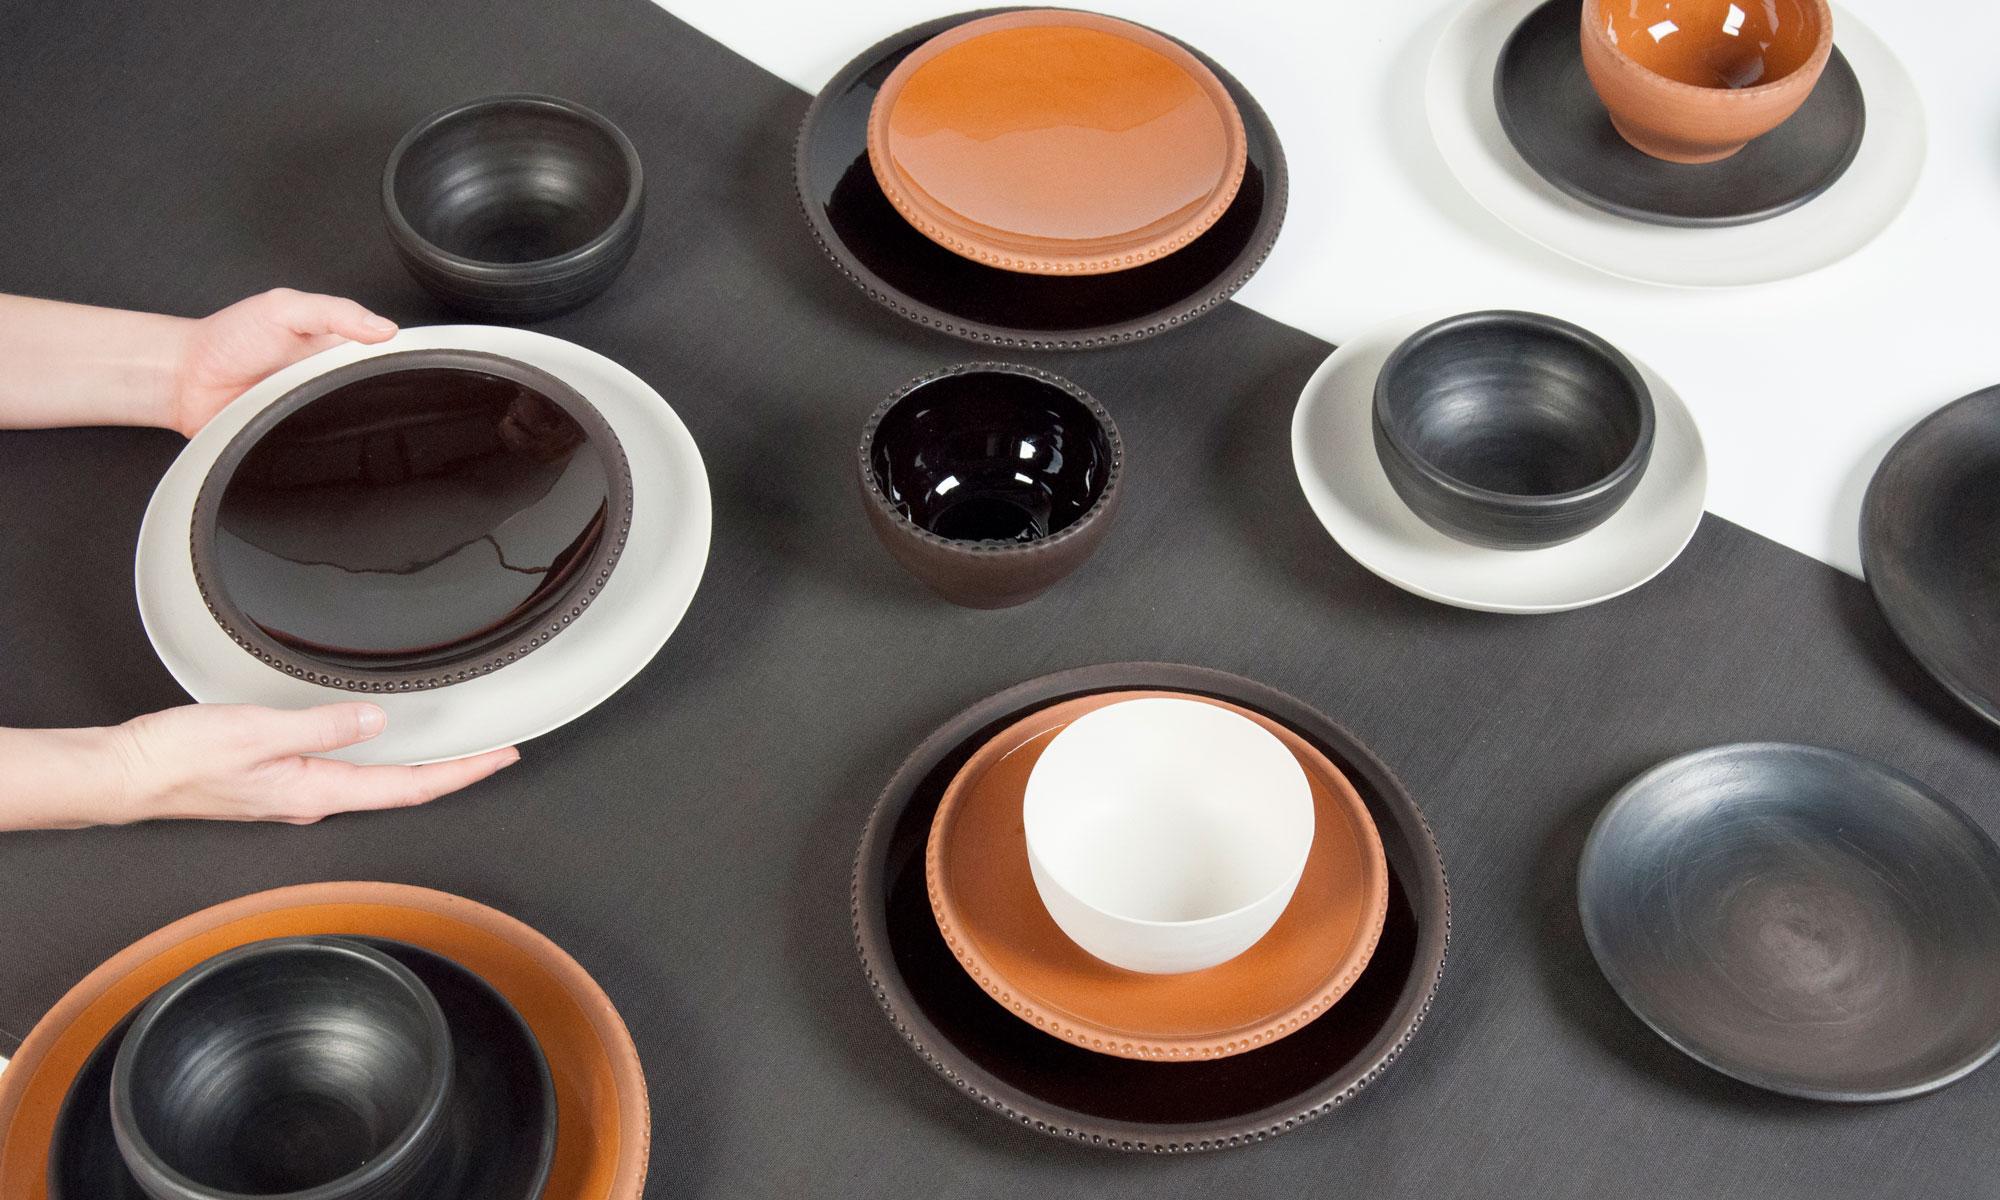 beate snuka ceramic network porcelain